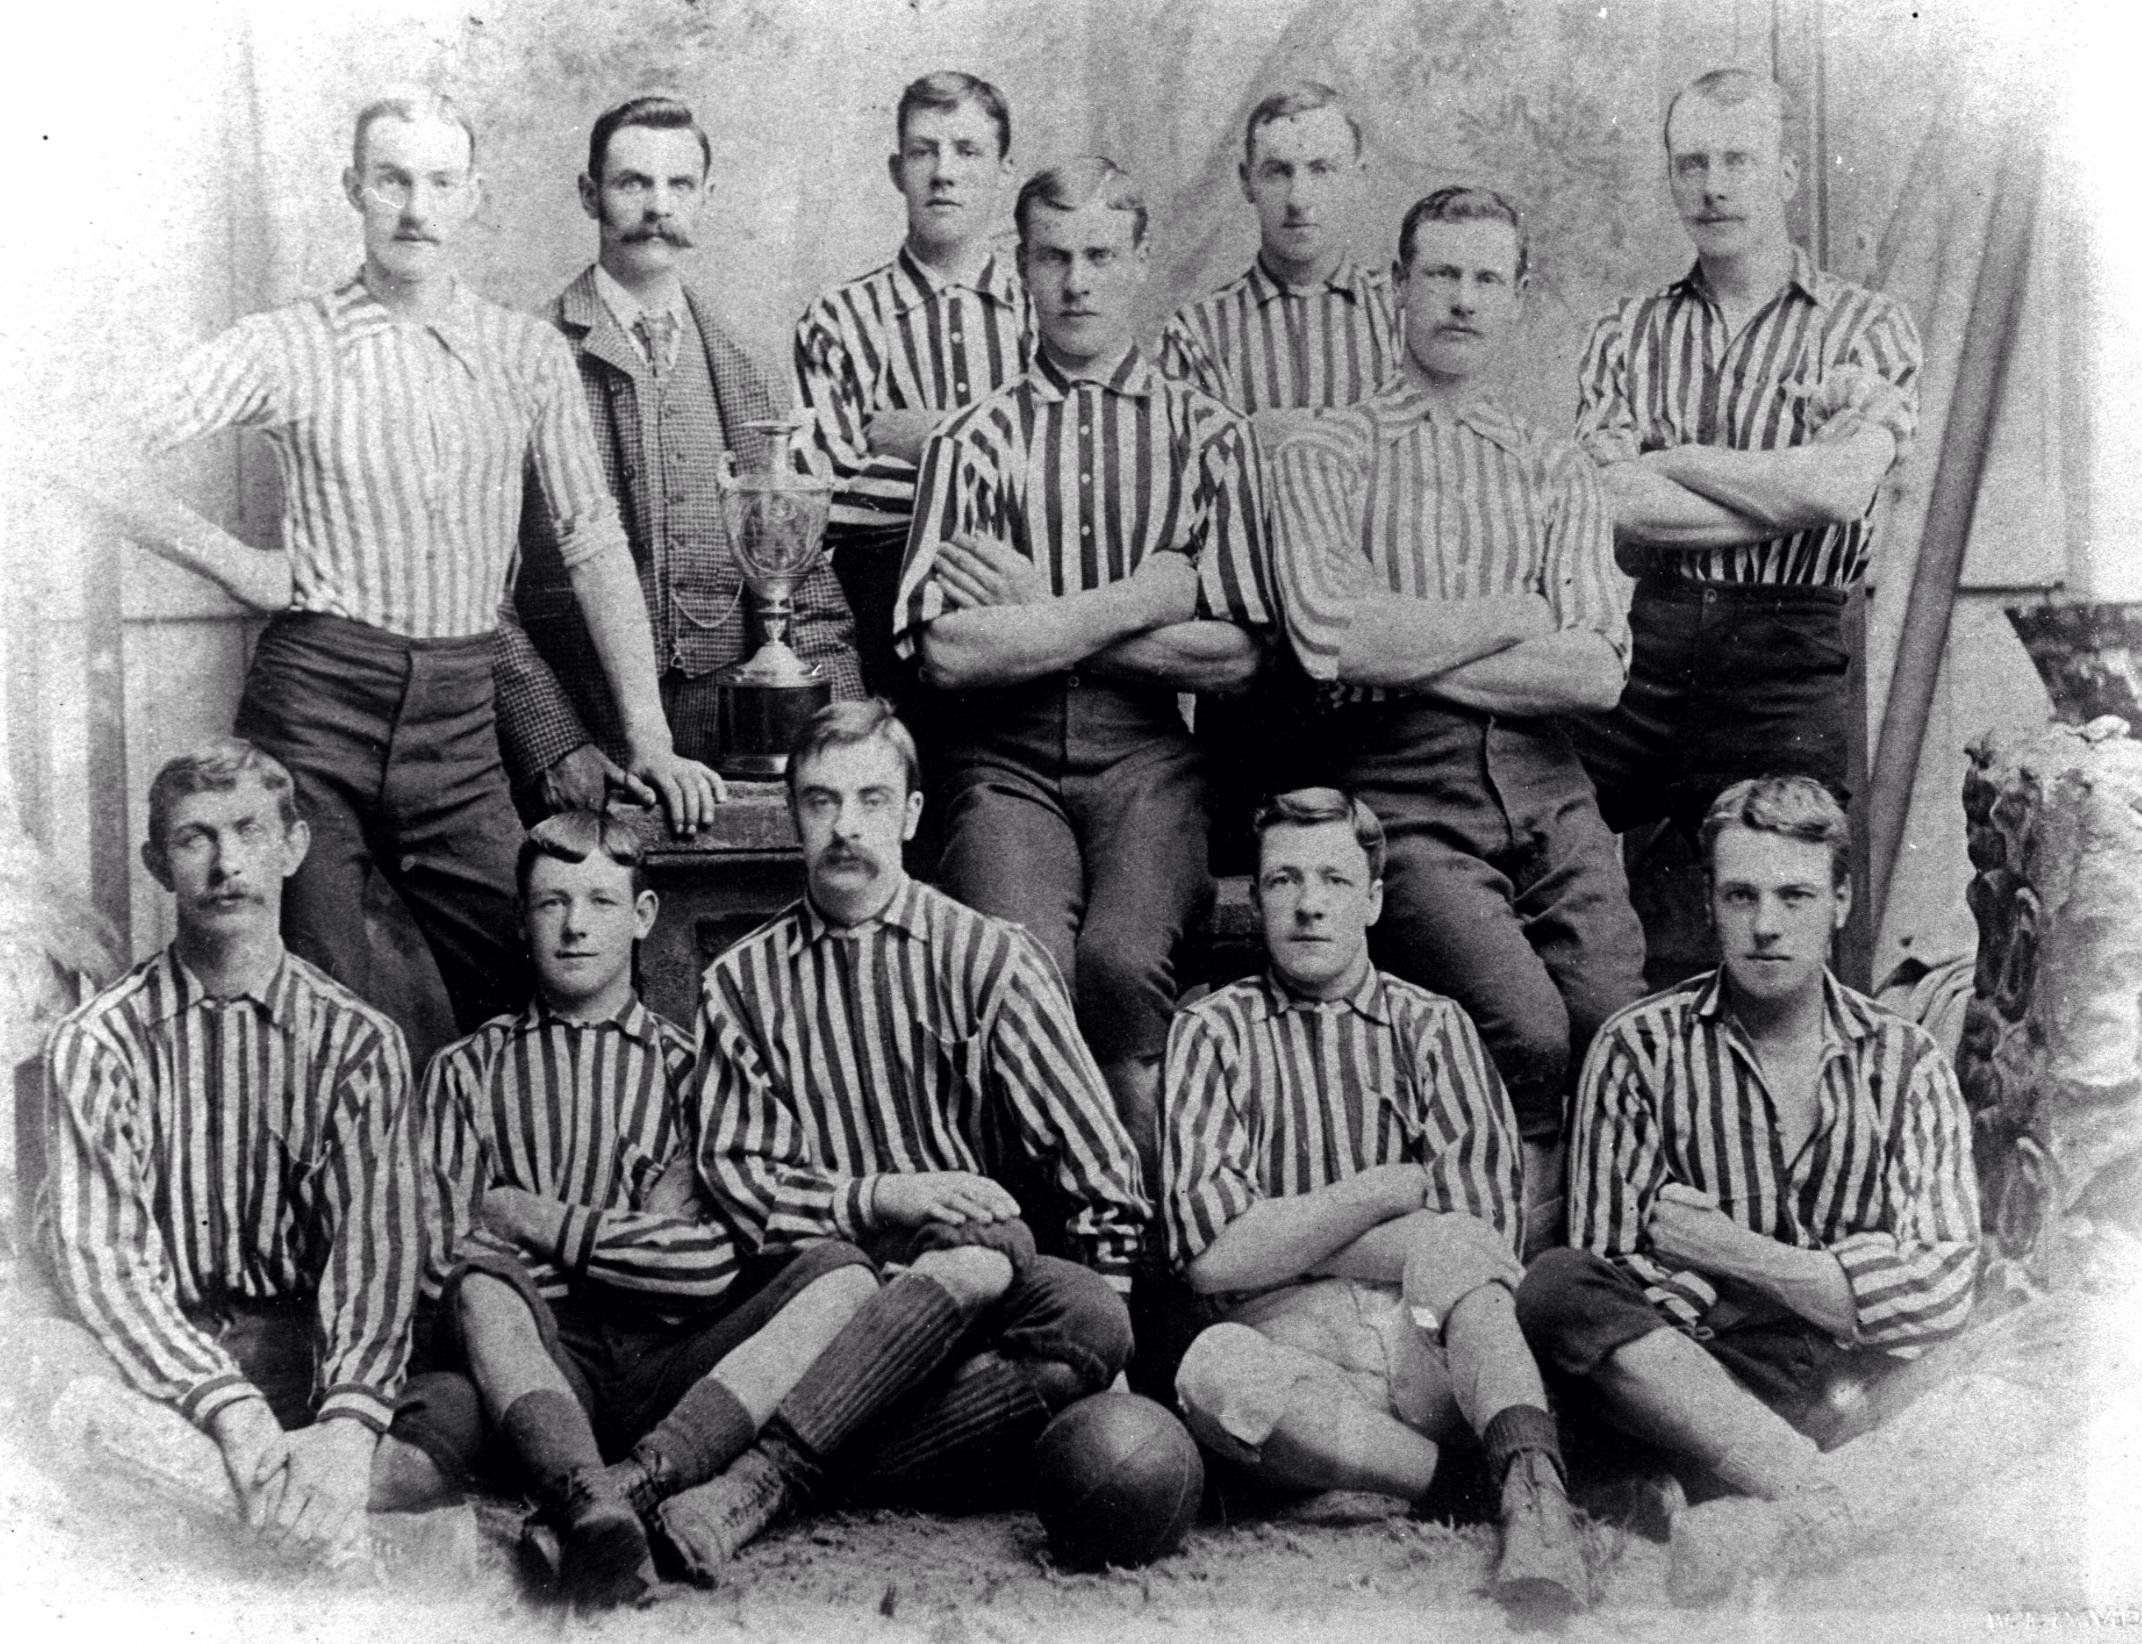 Moffat United Scotland around 1894